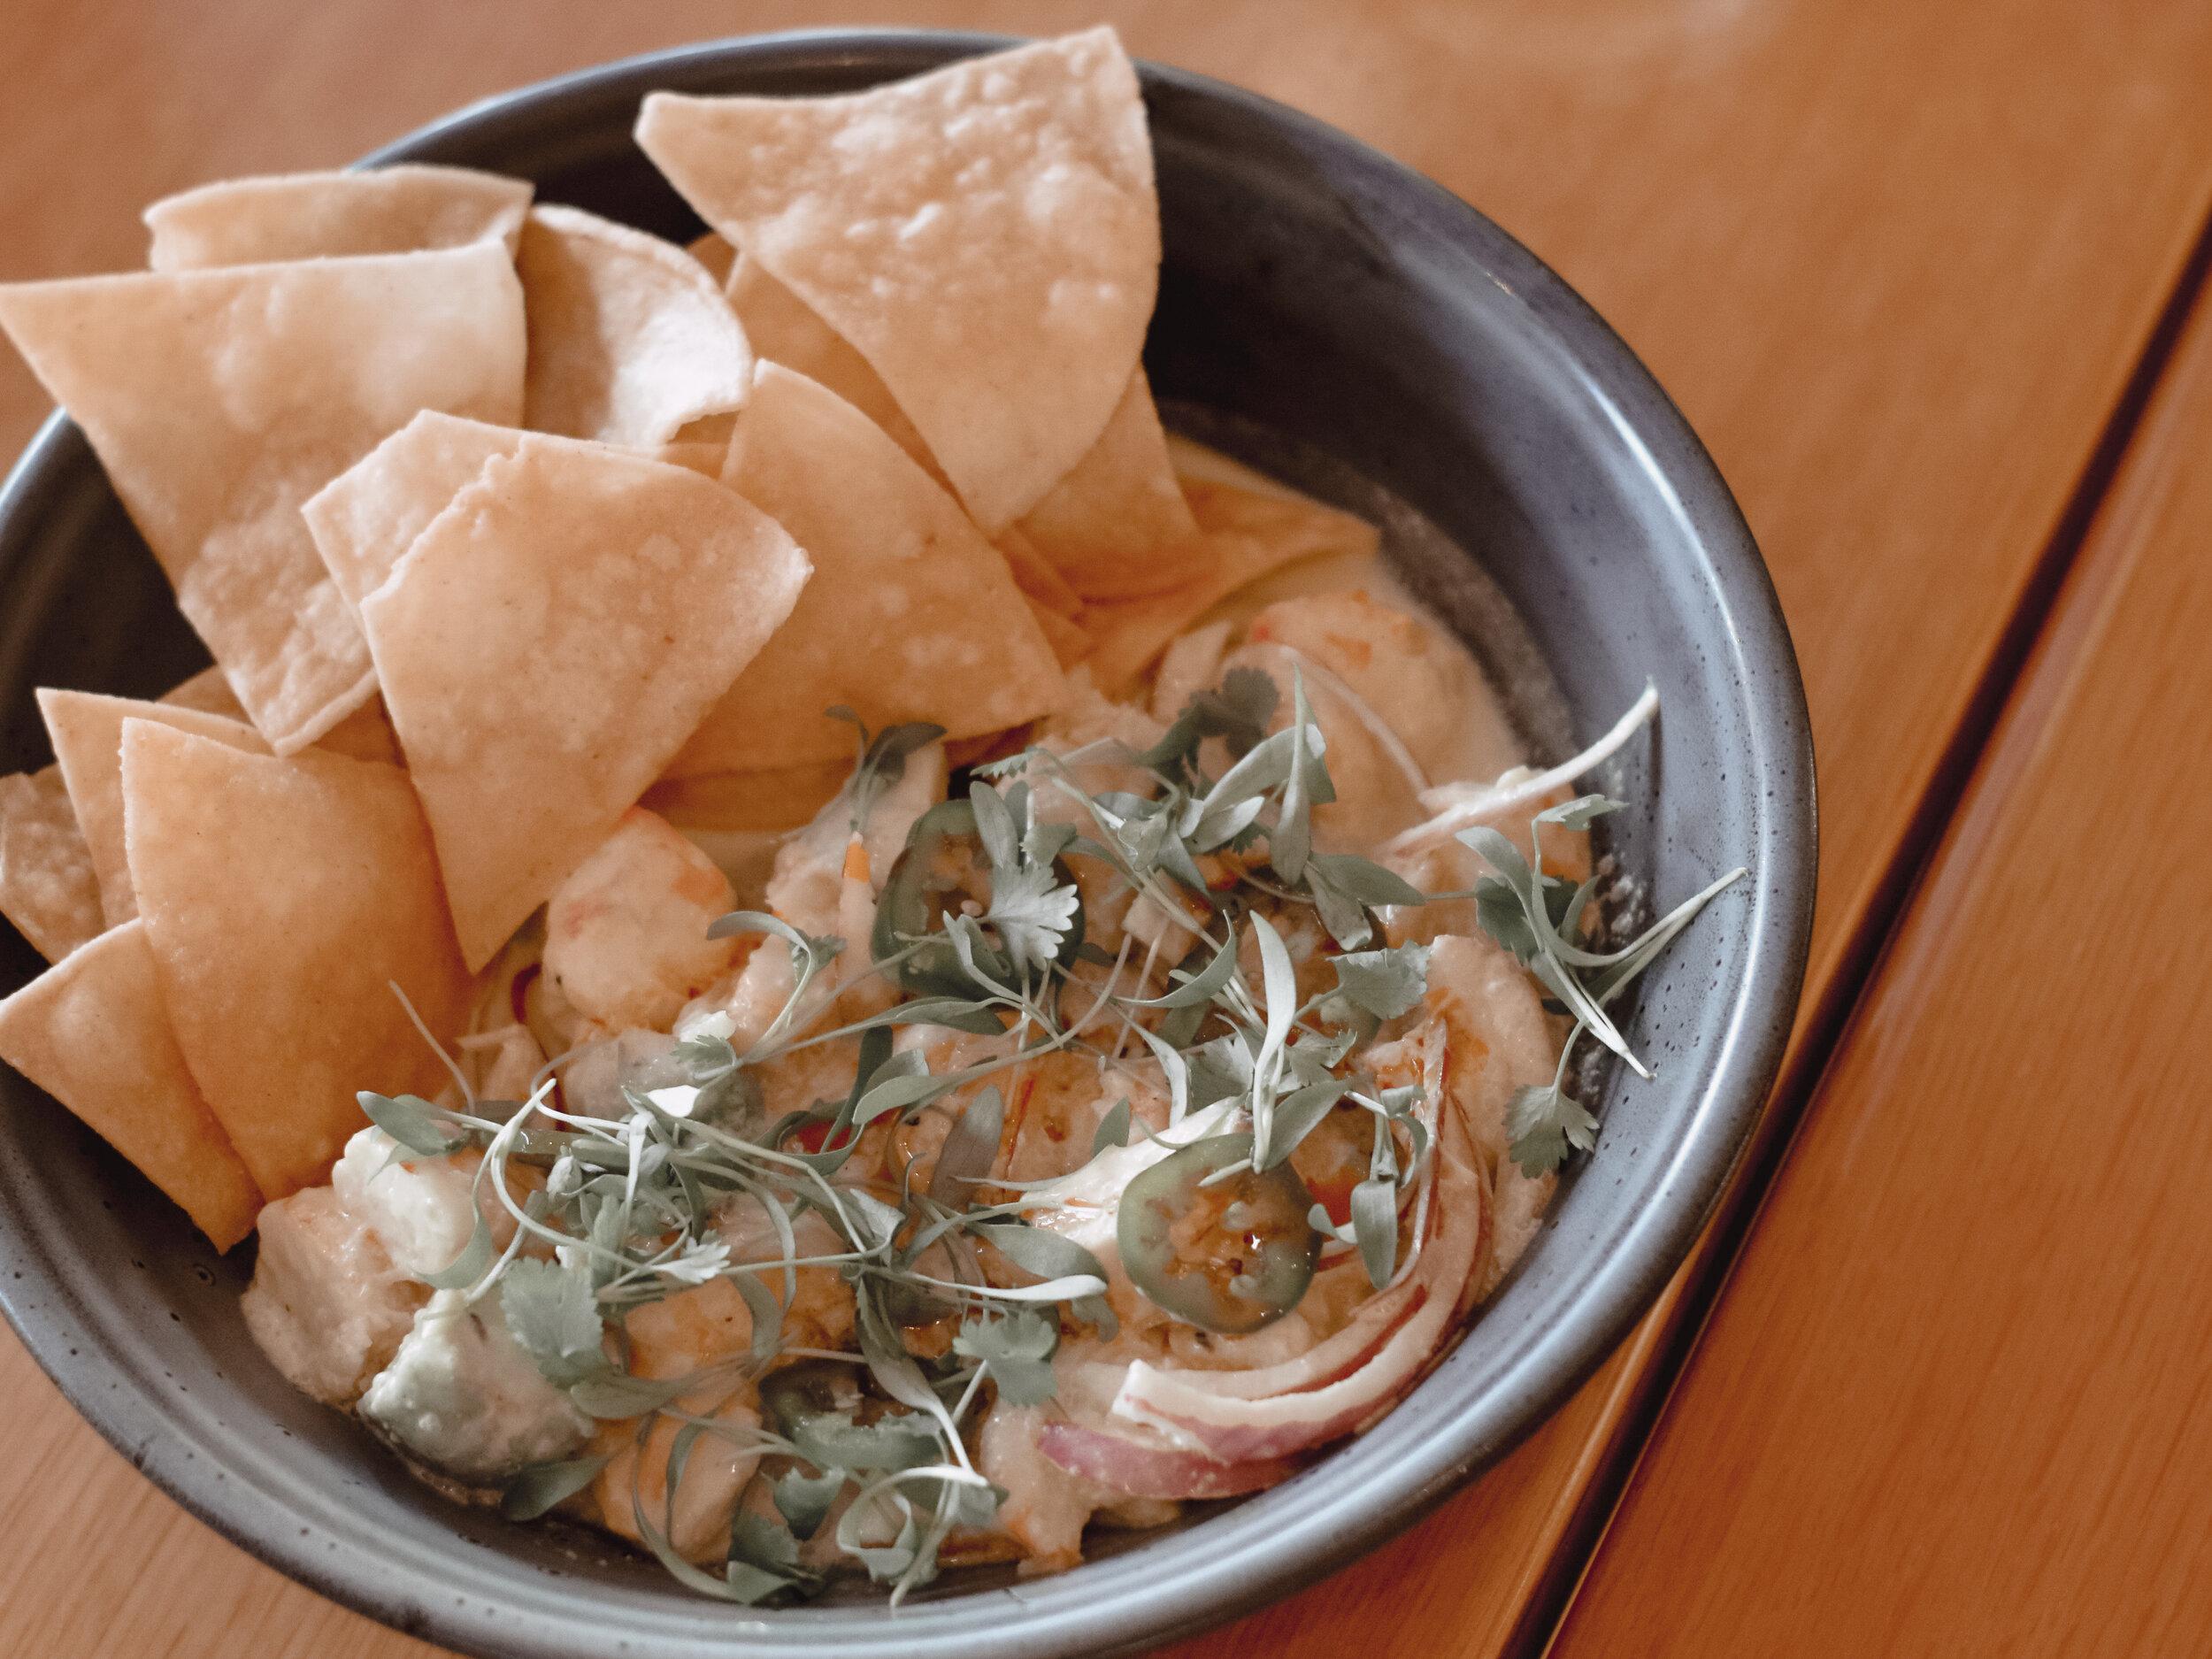 Eats Kitchen & Bar Irvine Shrimp Ceviche | AMANDANHAMMOND.COM